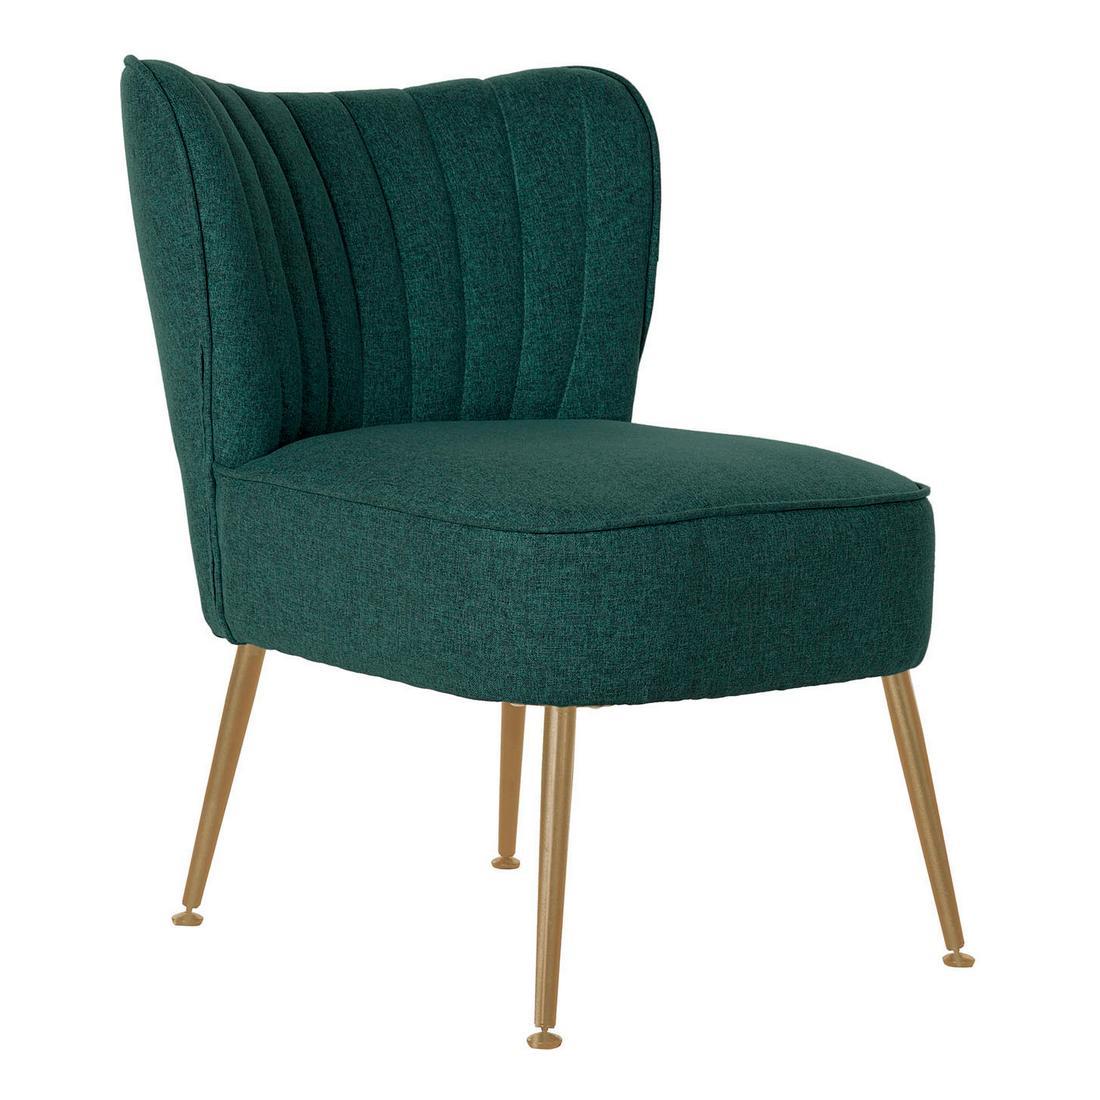 Armchair DKD Home Decor Green Polyester Metal (55 x 64 x 72.5 cm)